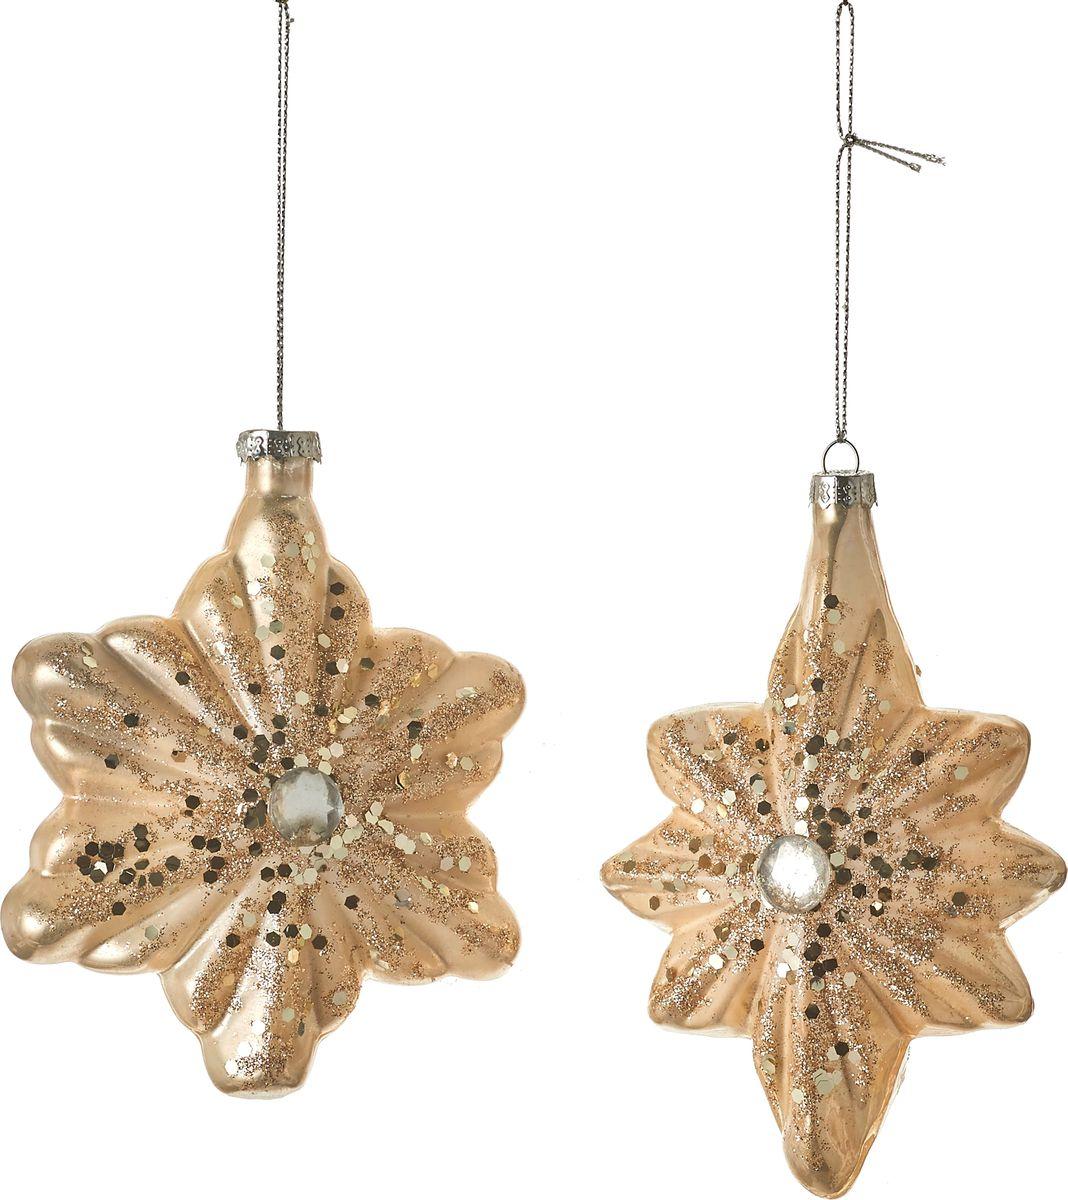 "Набор новогодних декоративных украшений House of Seasons ""Лист"", цвет: коричневый, 13 х 10 х 4 см, 2 шт"